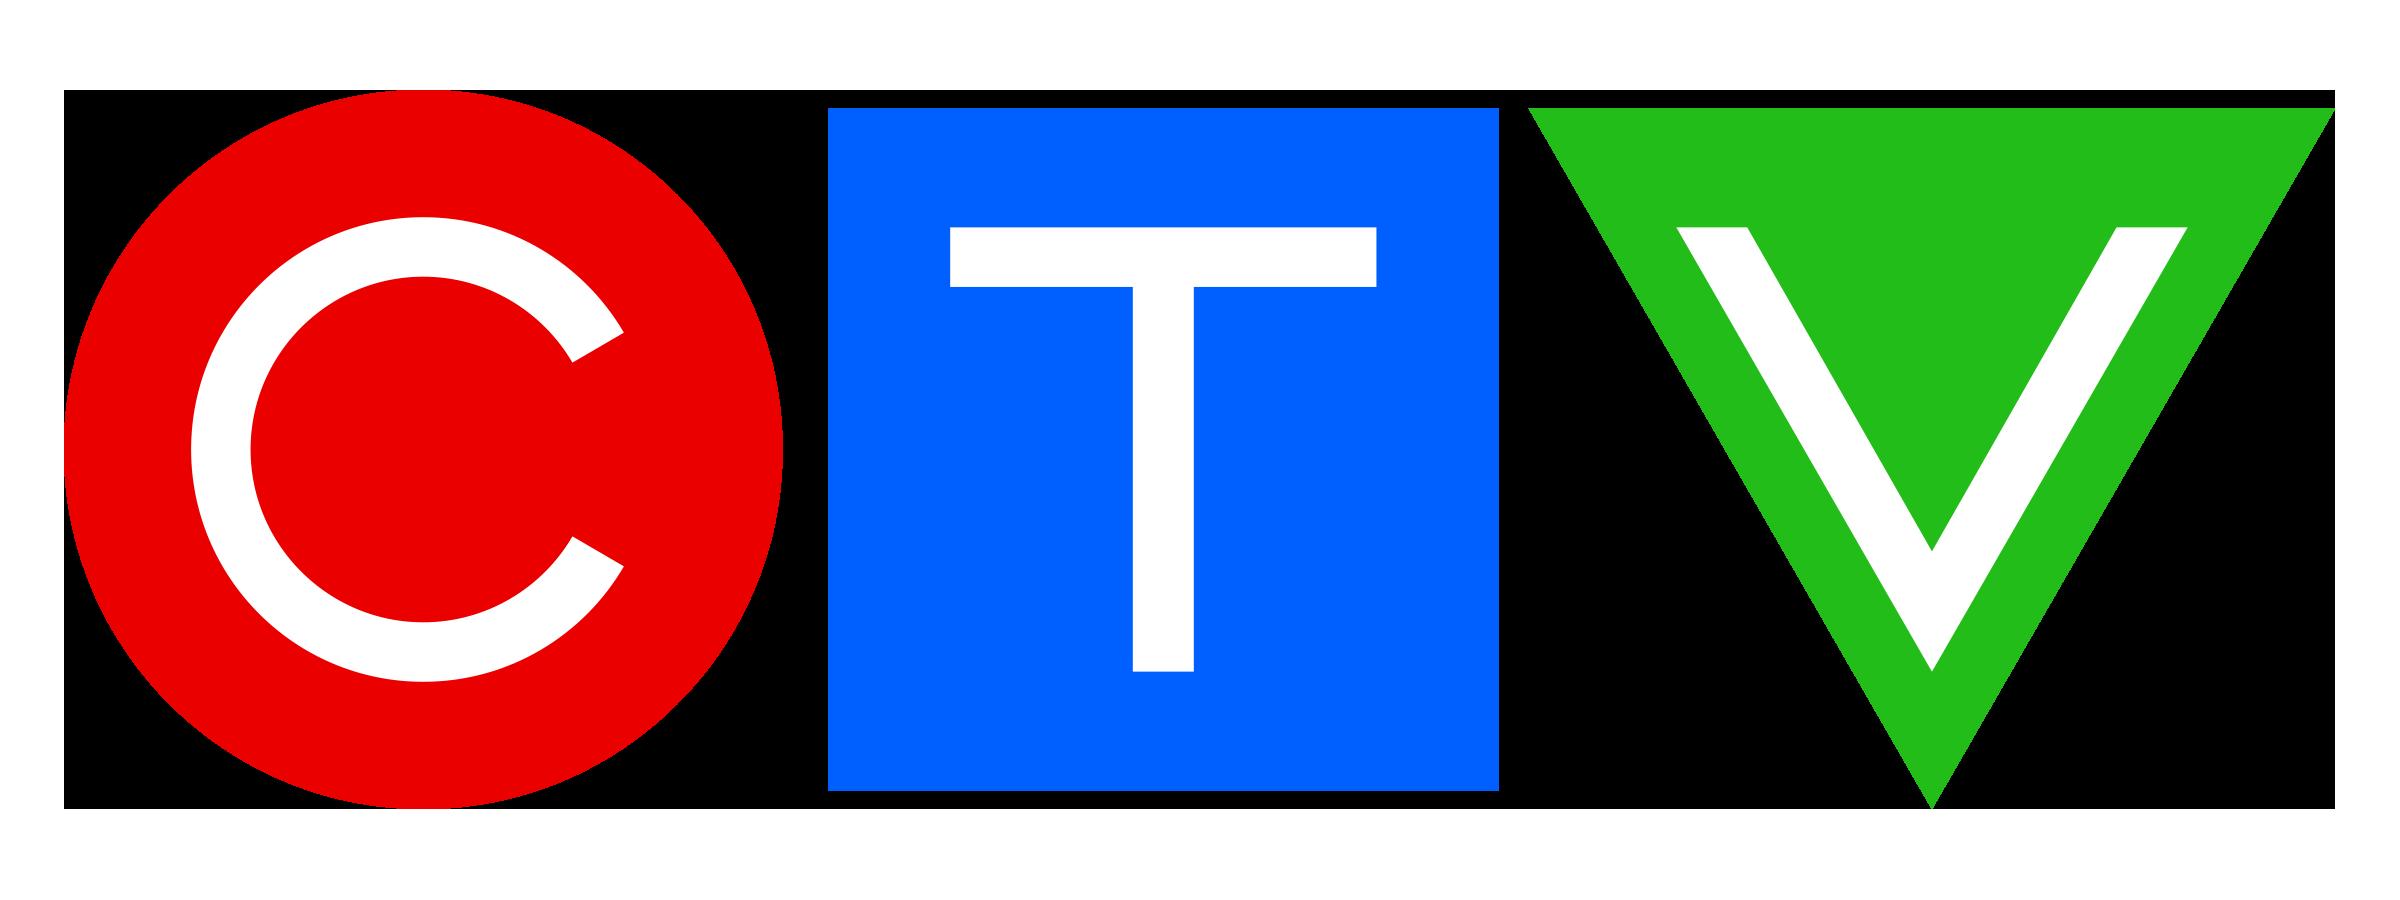 Fibe TV Channels Comparison